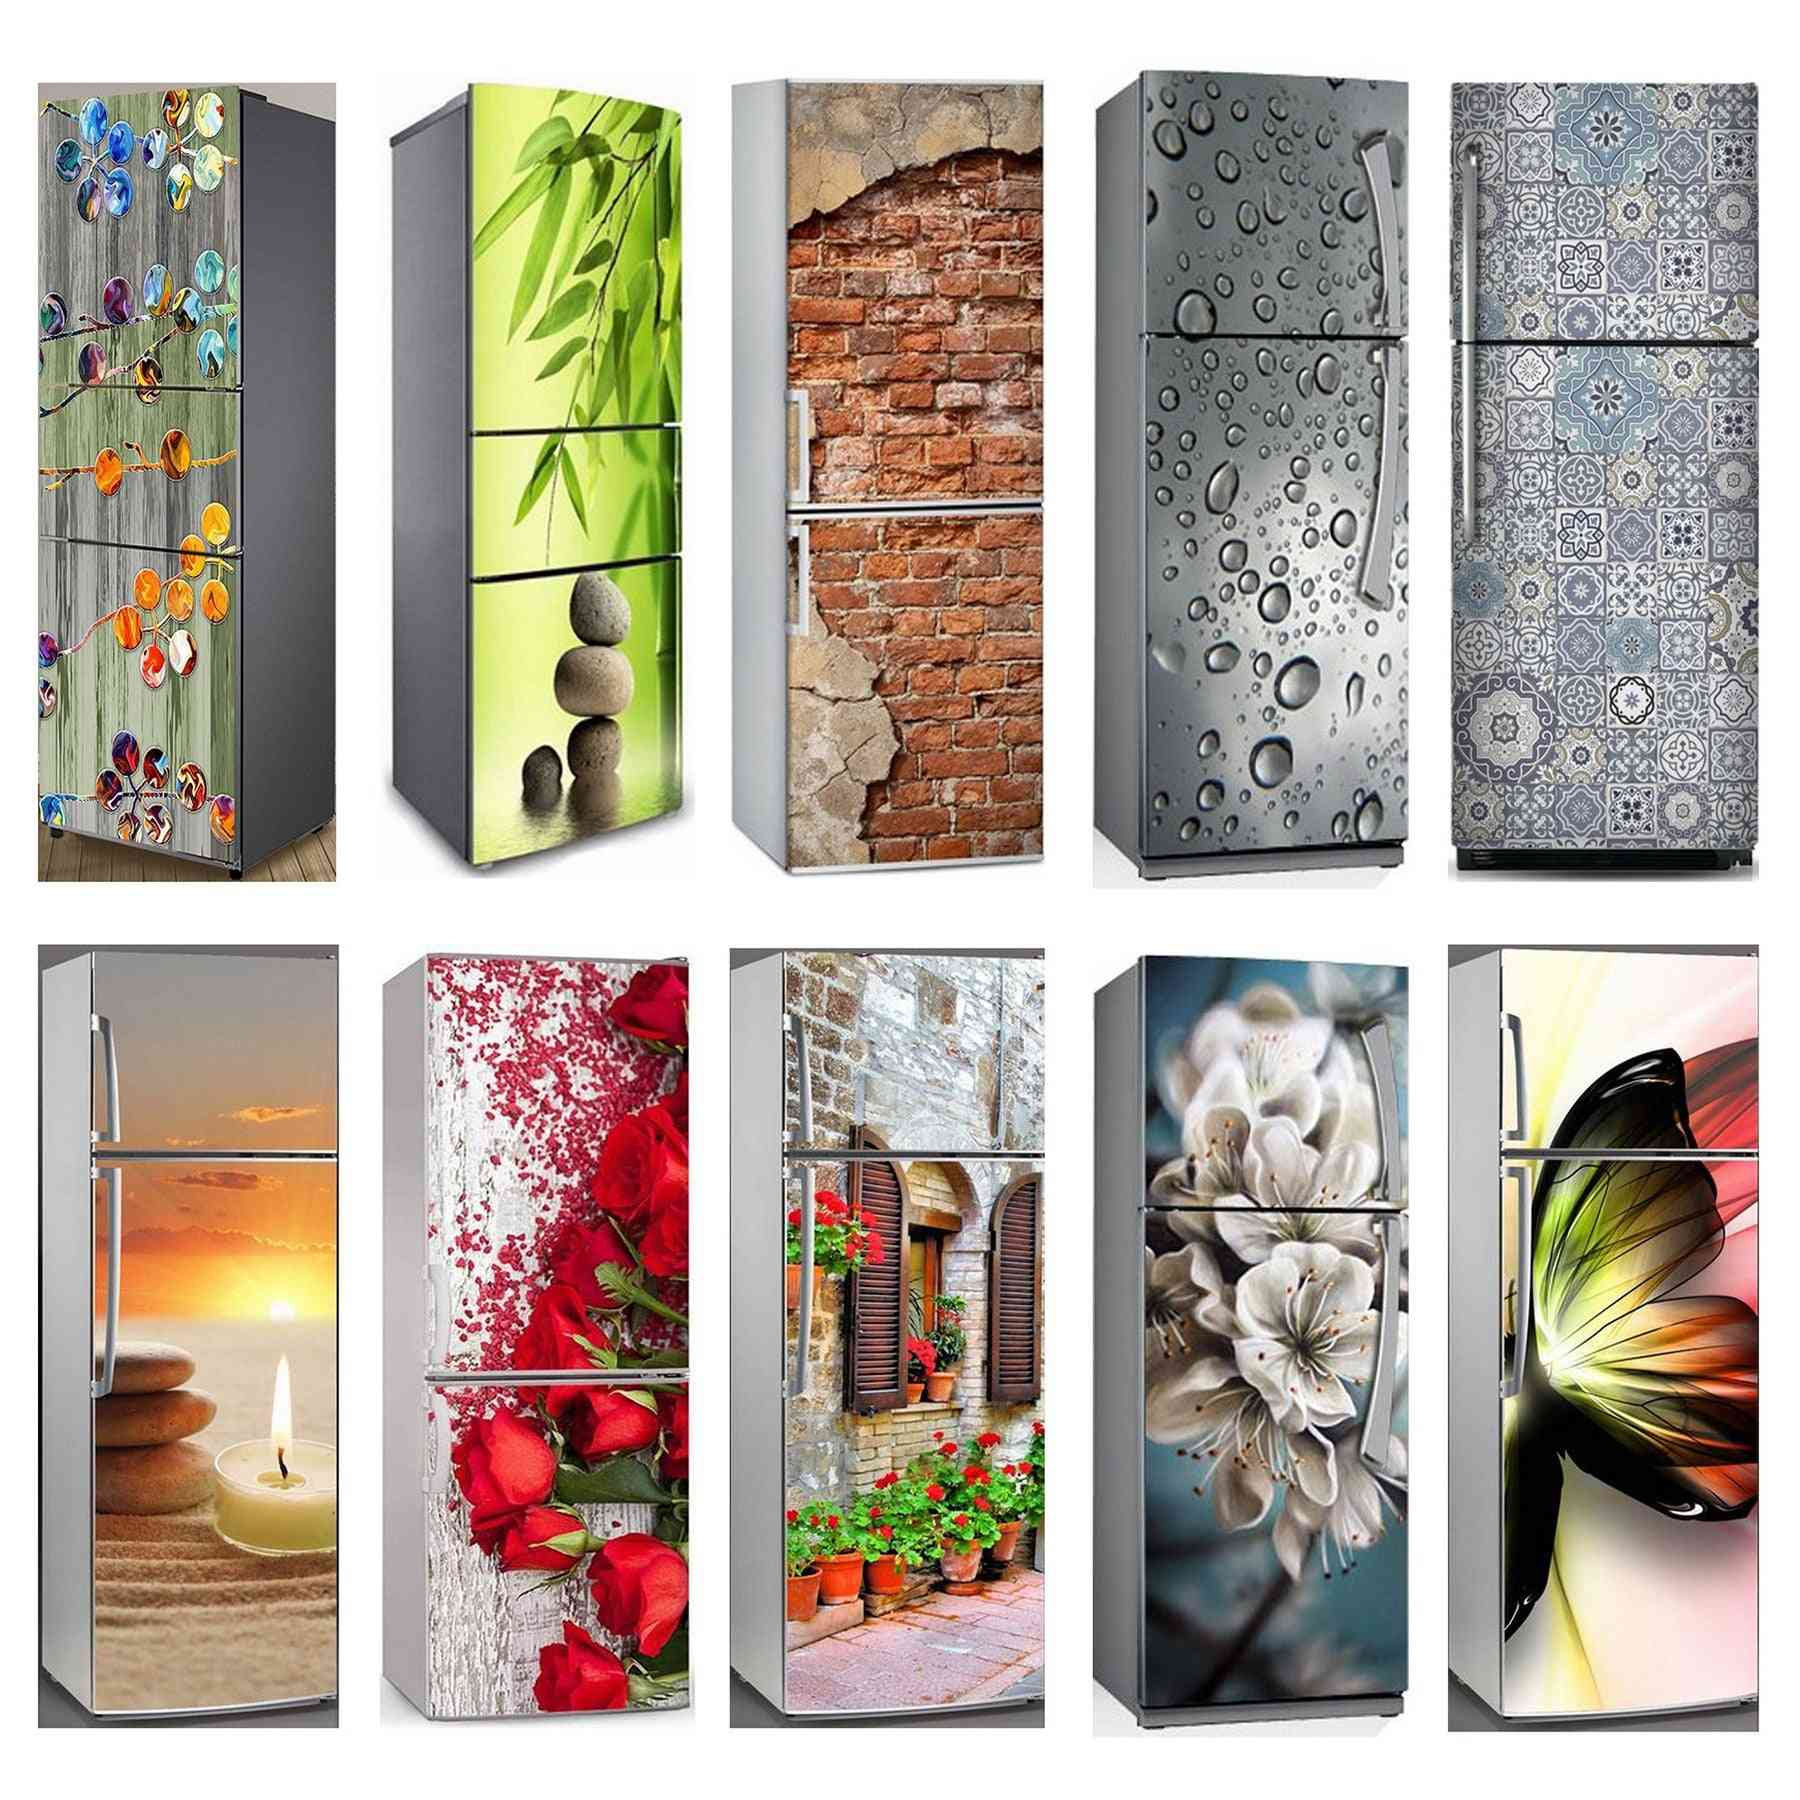 3d Self Adhesive Fridge Door Cover Wallpaper